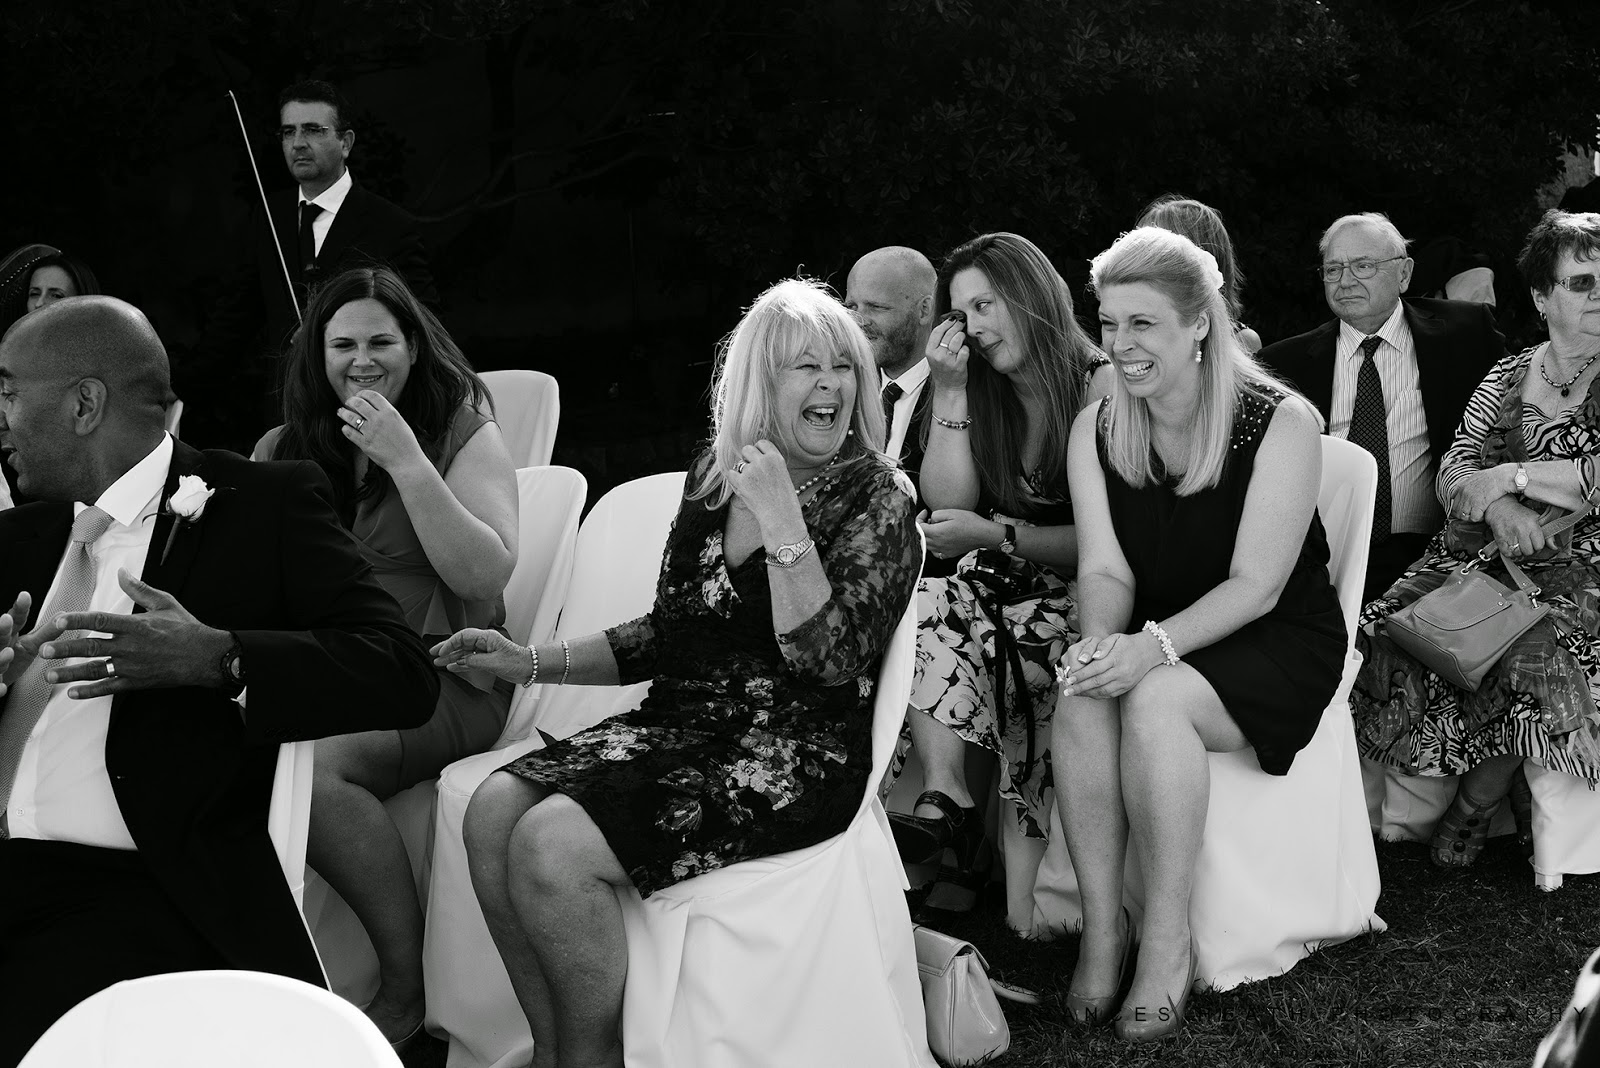 Wedding ceremony at Ravello town hall